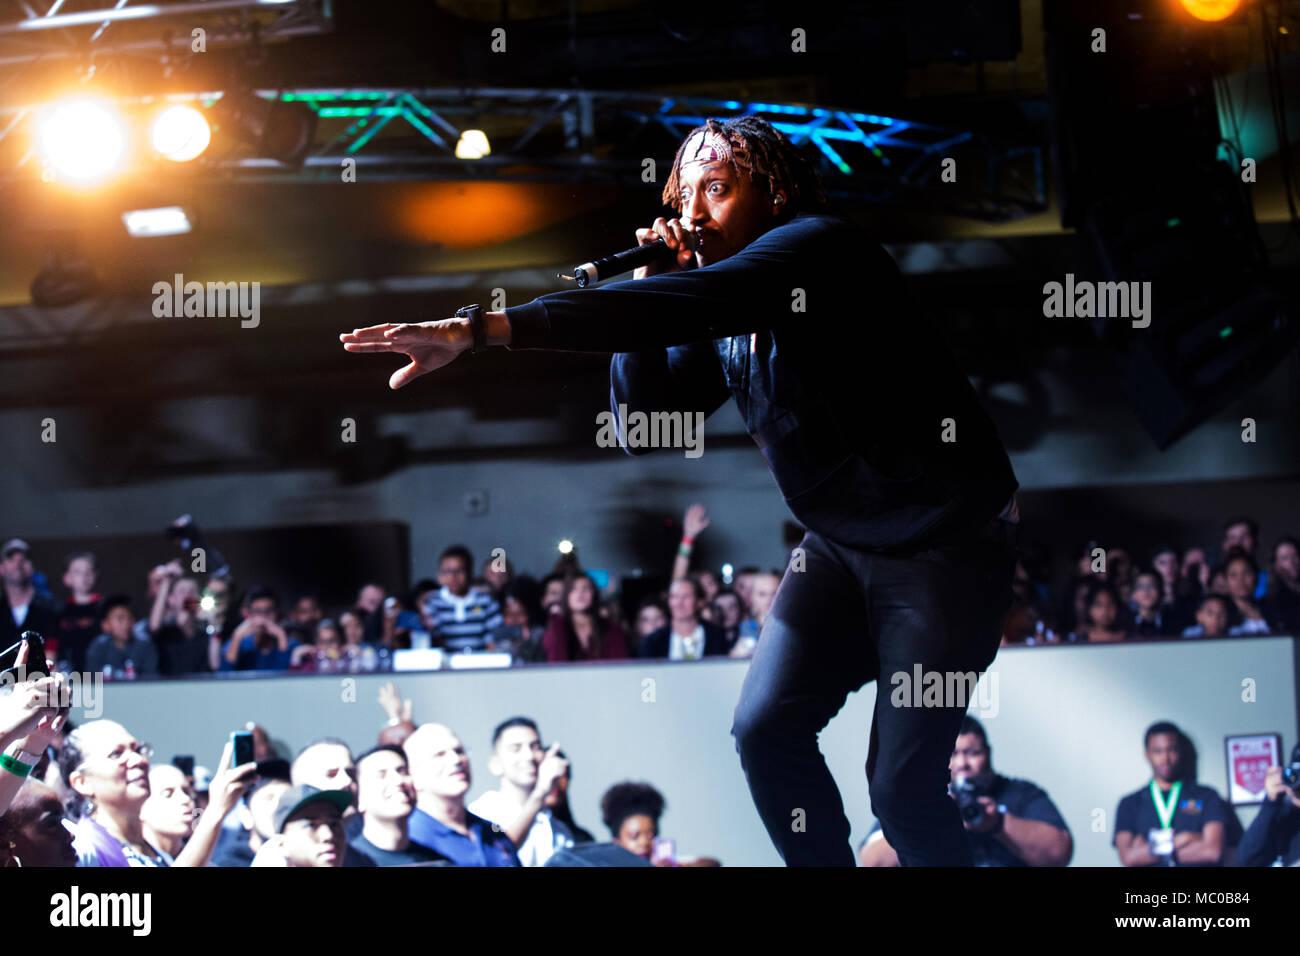 Grammy award winning hip-hop artist Lecrae performs for